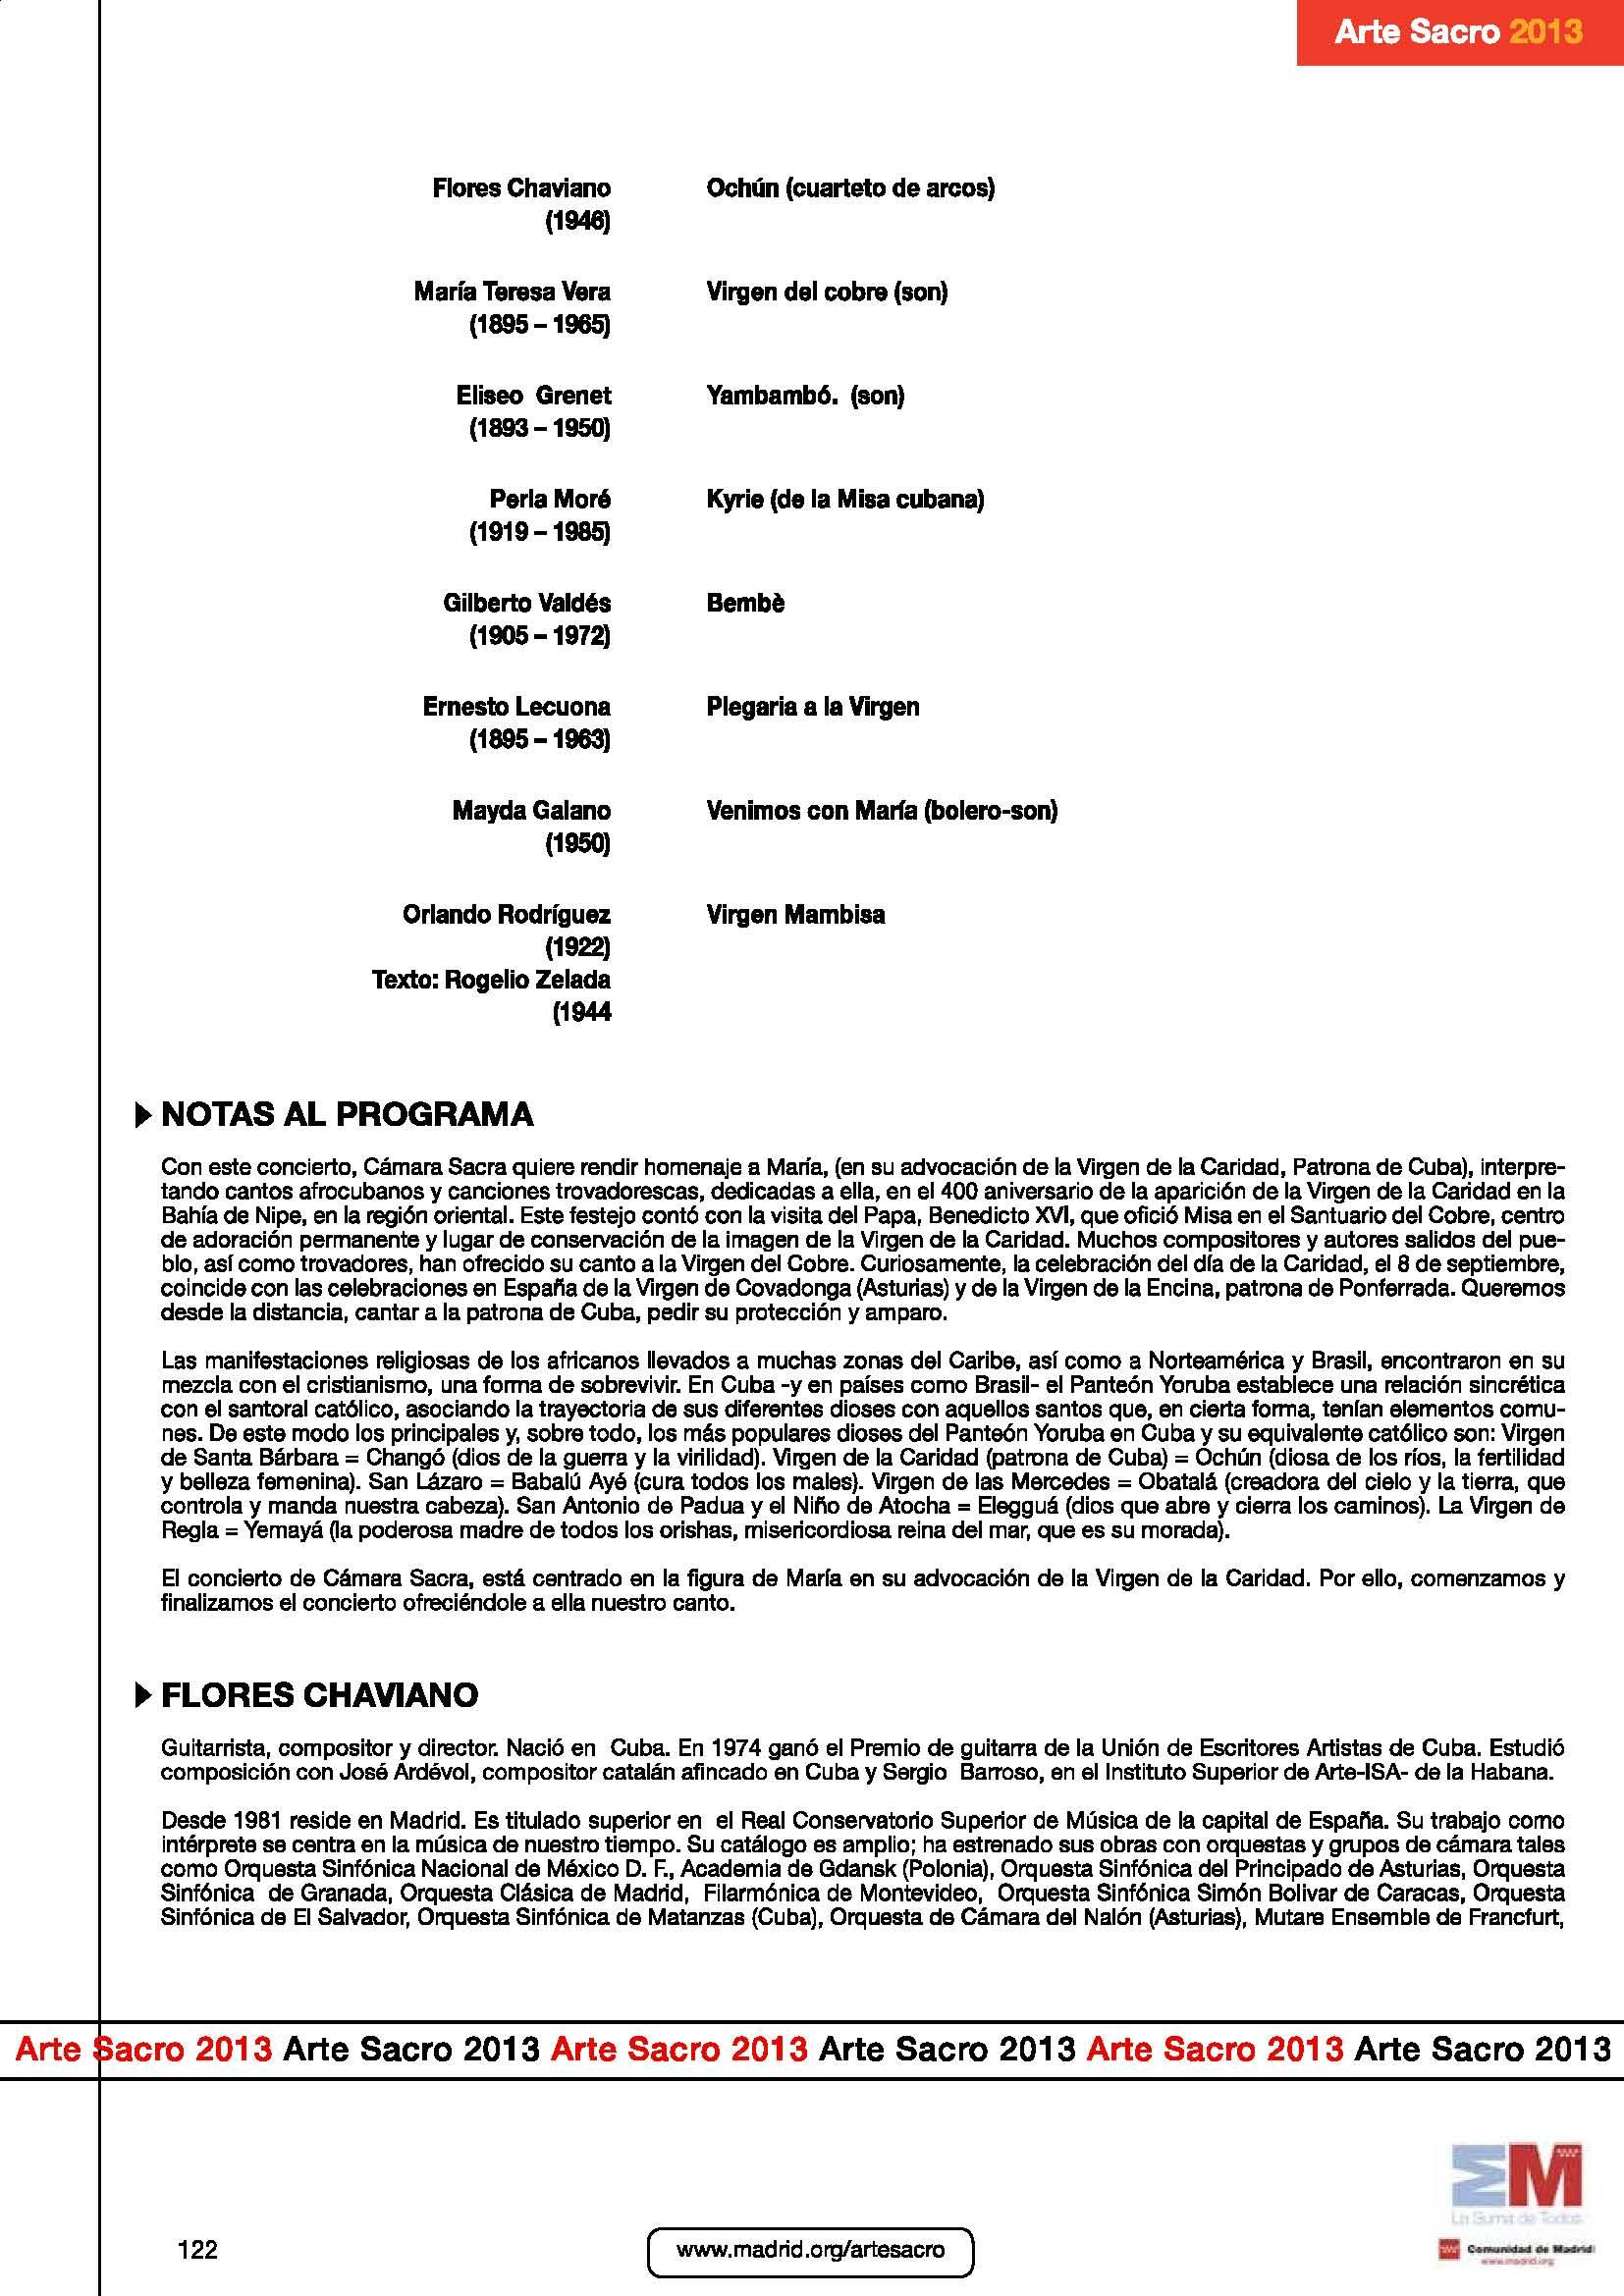 dossier_completo_Página_122